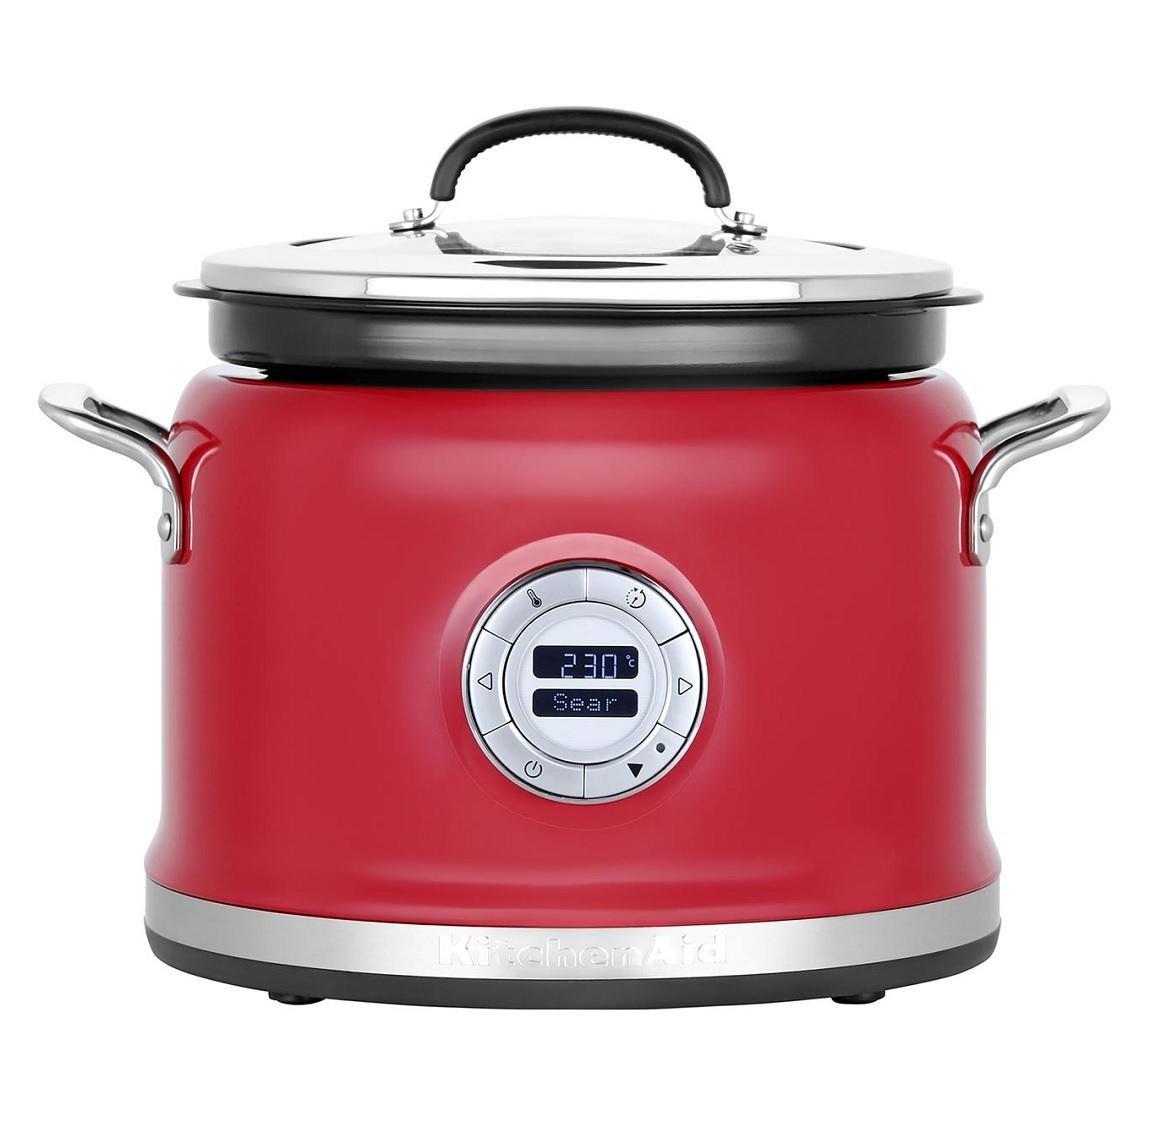 Kitchenaid 5kmc4241ber Digital Multi Cooker 4 25 Litre 700w Empire